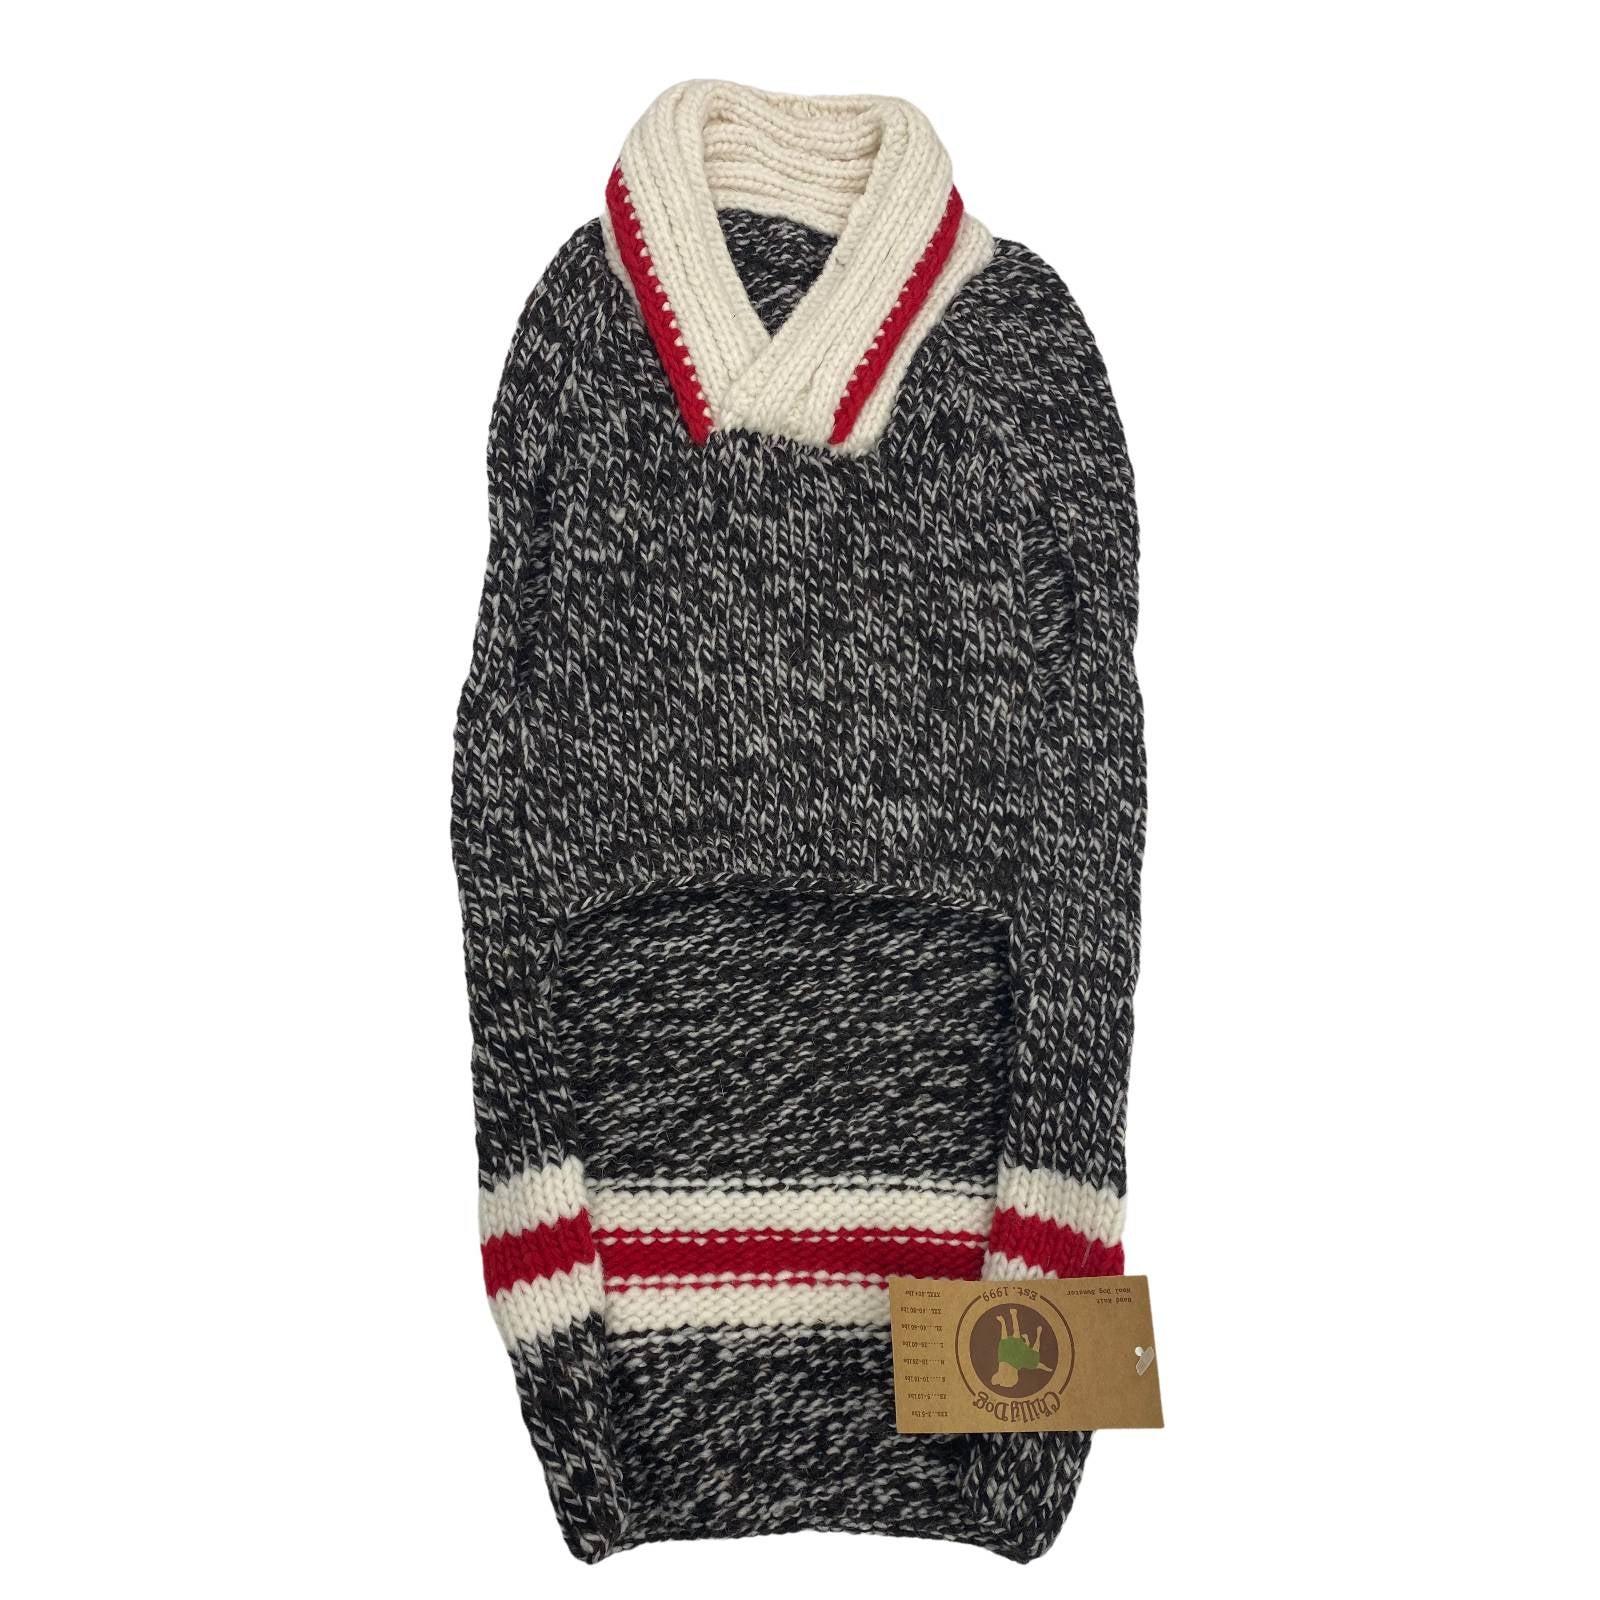 Large Black Hand Knit Wool Dog Sweater